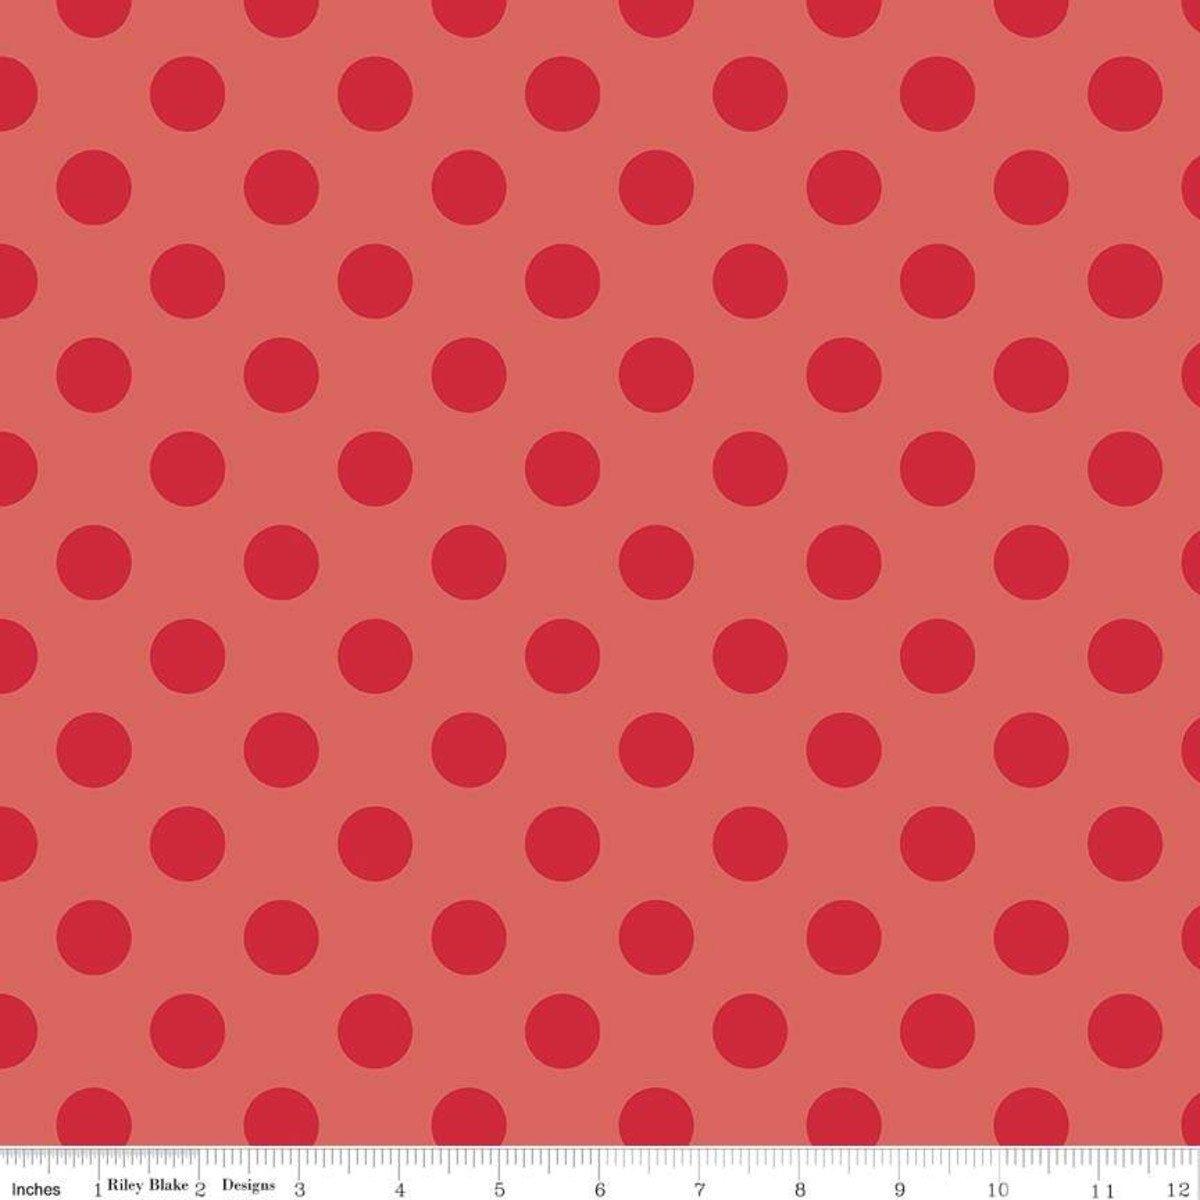 sc430-80-red sparkle Medium Polka Dots